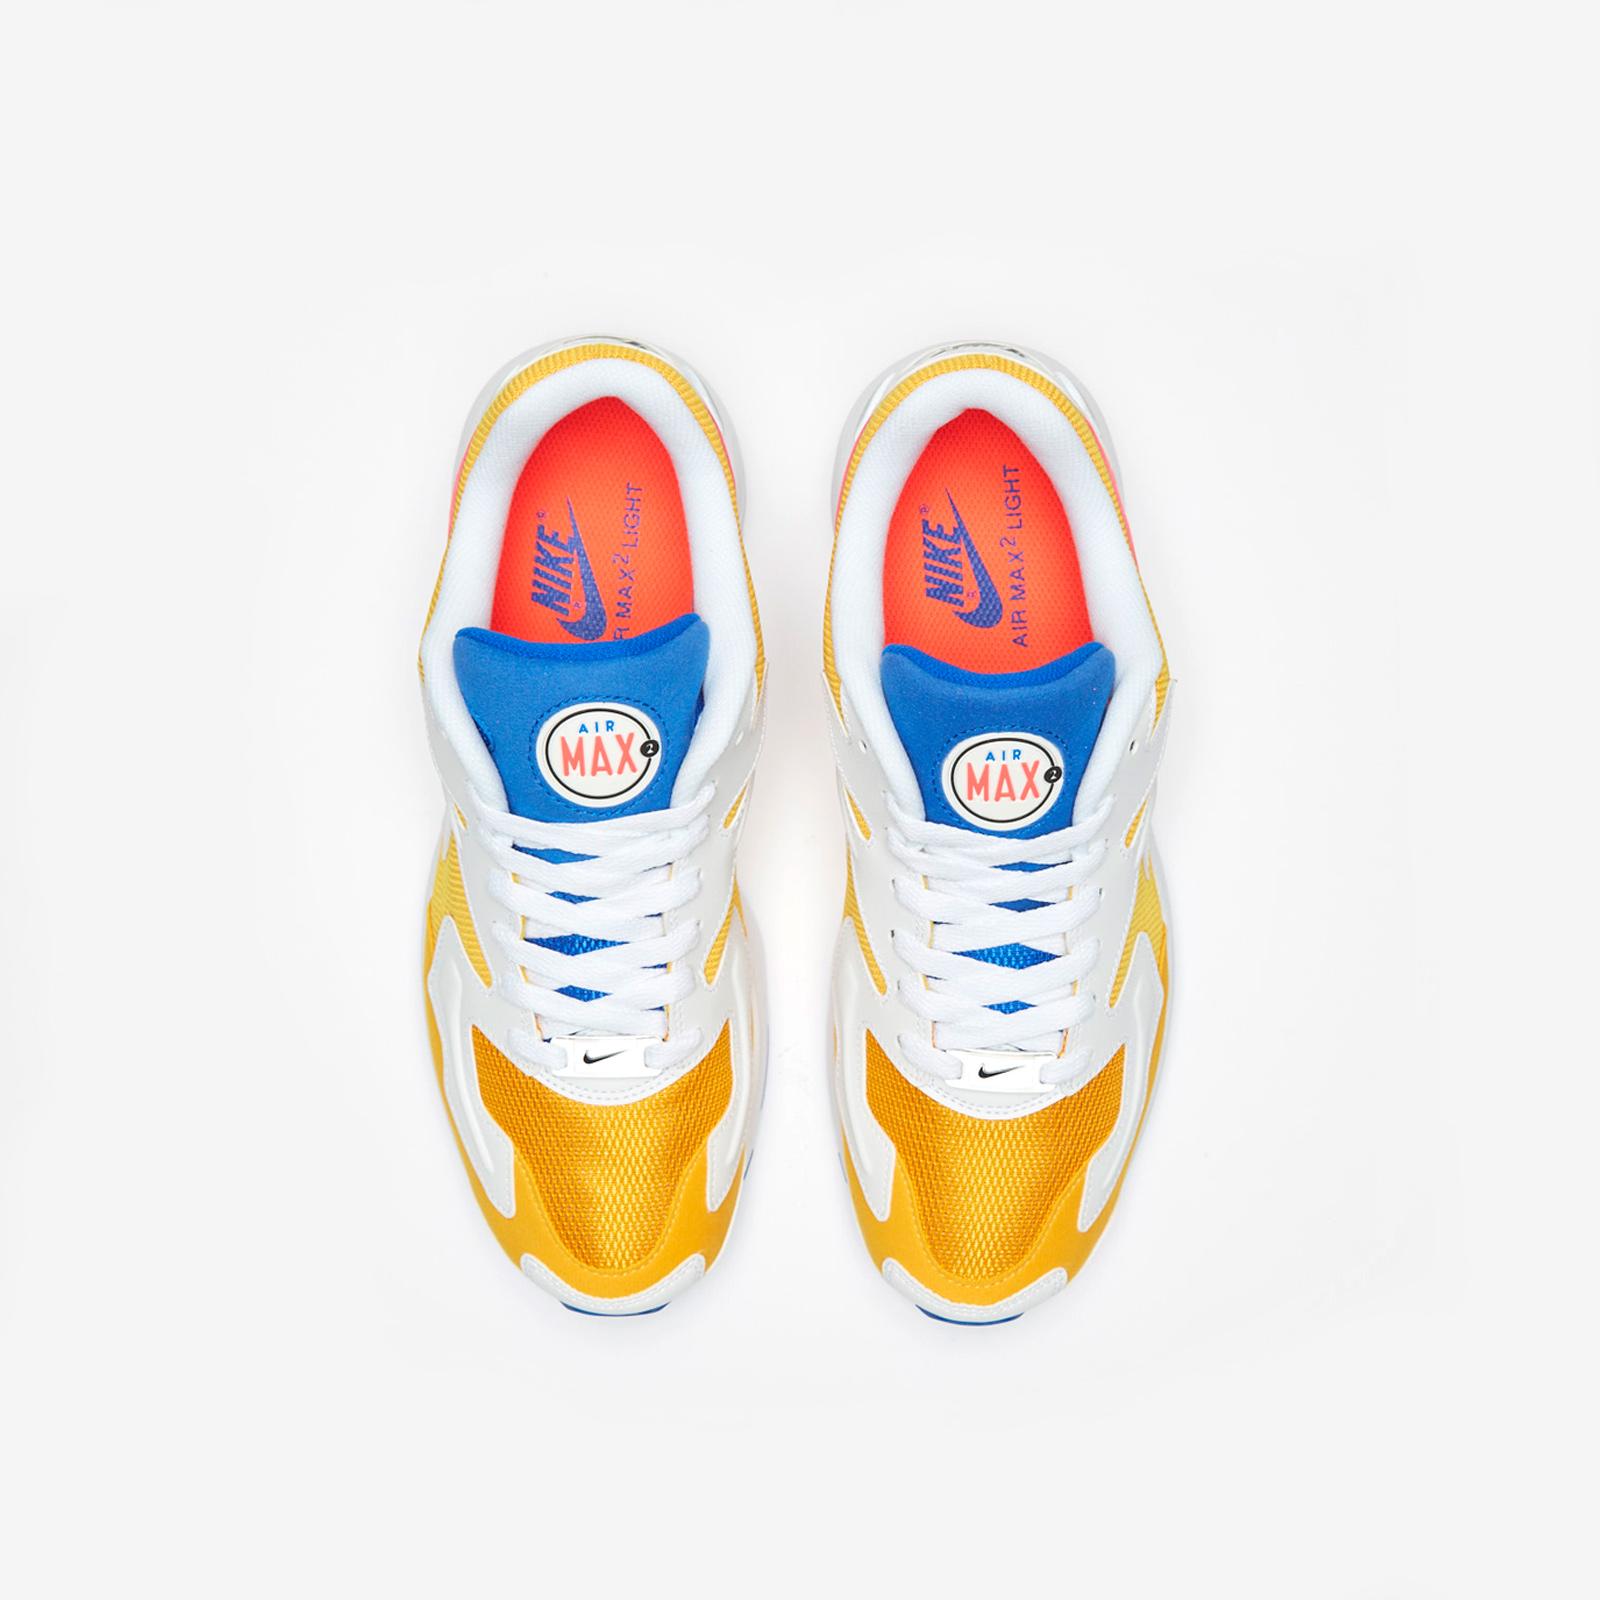 online store e94ce a1fd3 Nike Air Max2 Light - Ao1741-700 - Sneakersnstuff I Sneakers   Streetwear  online seit 1999